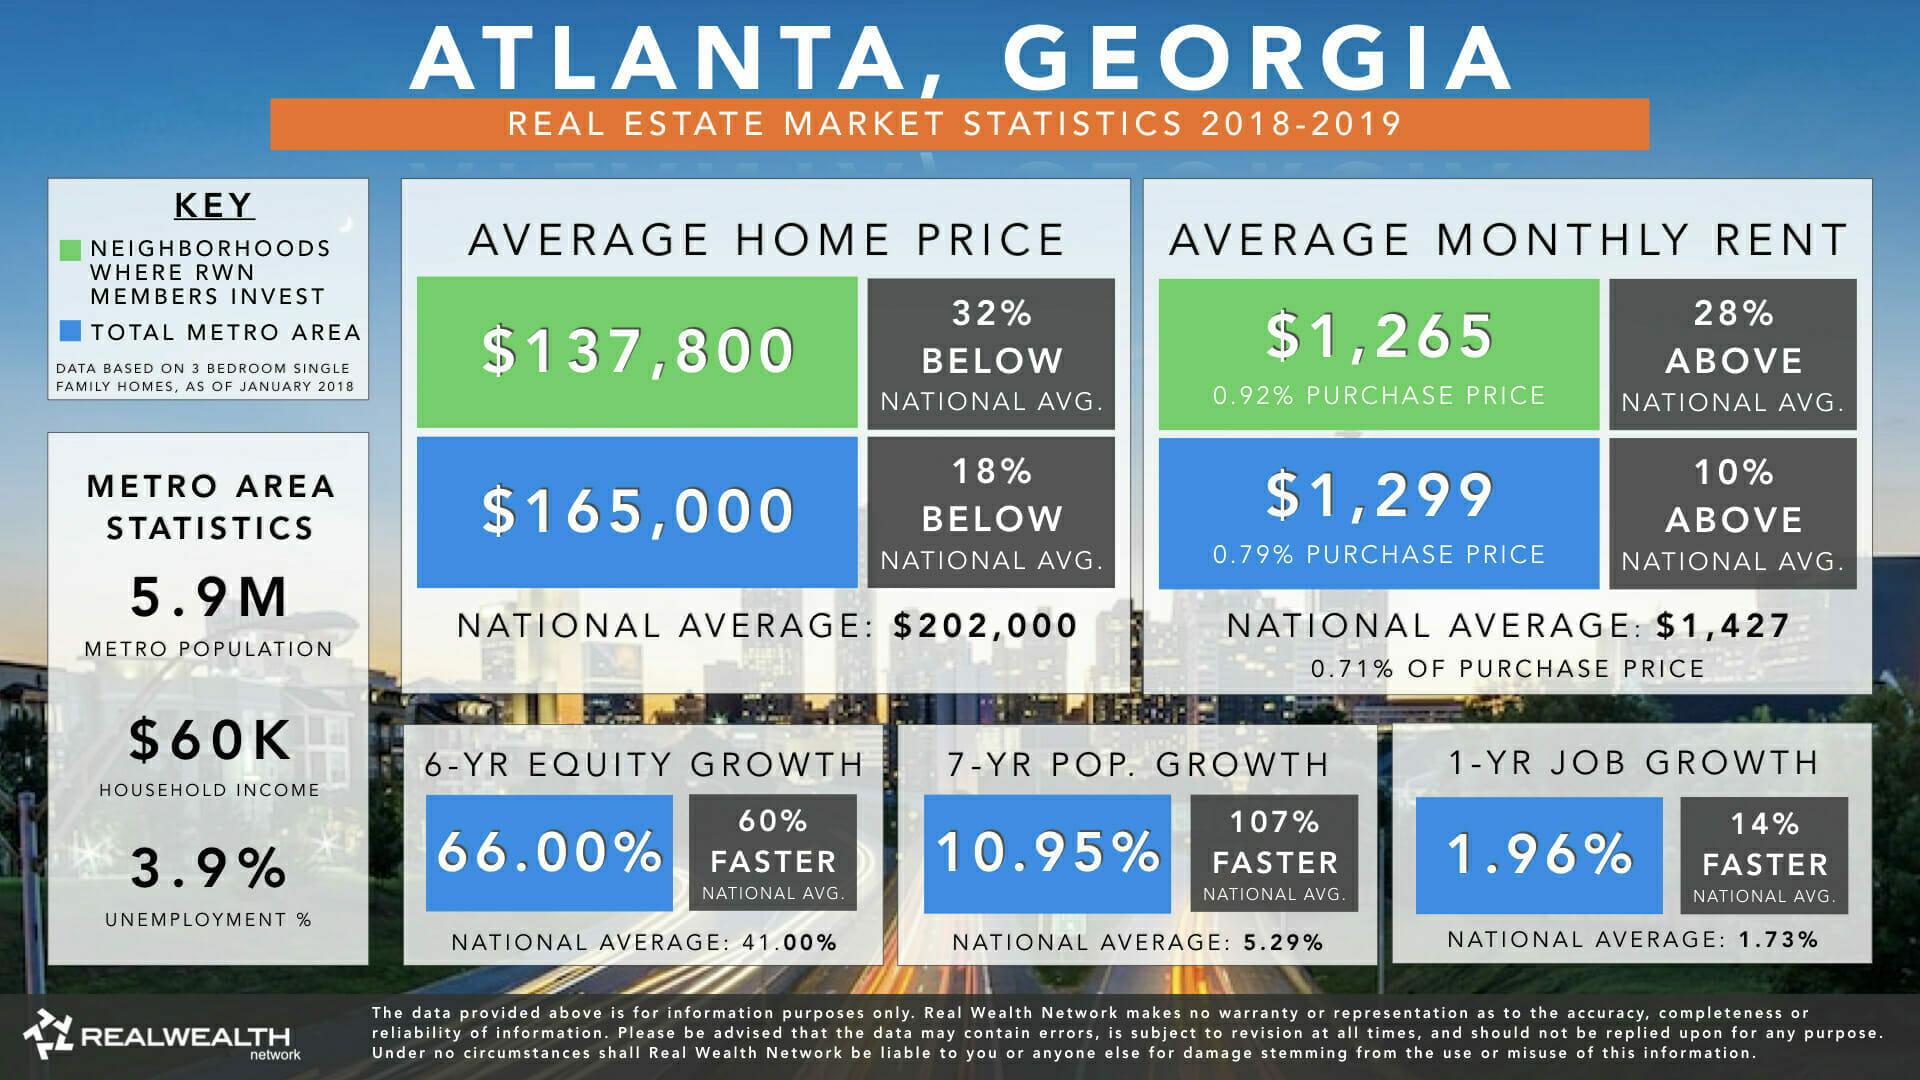 Atlanta, GA | Real Estate Market Statistics & Trends 2019